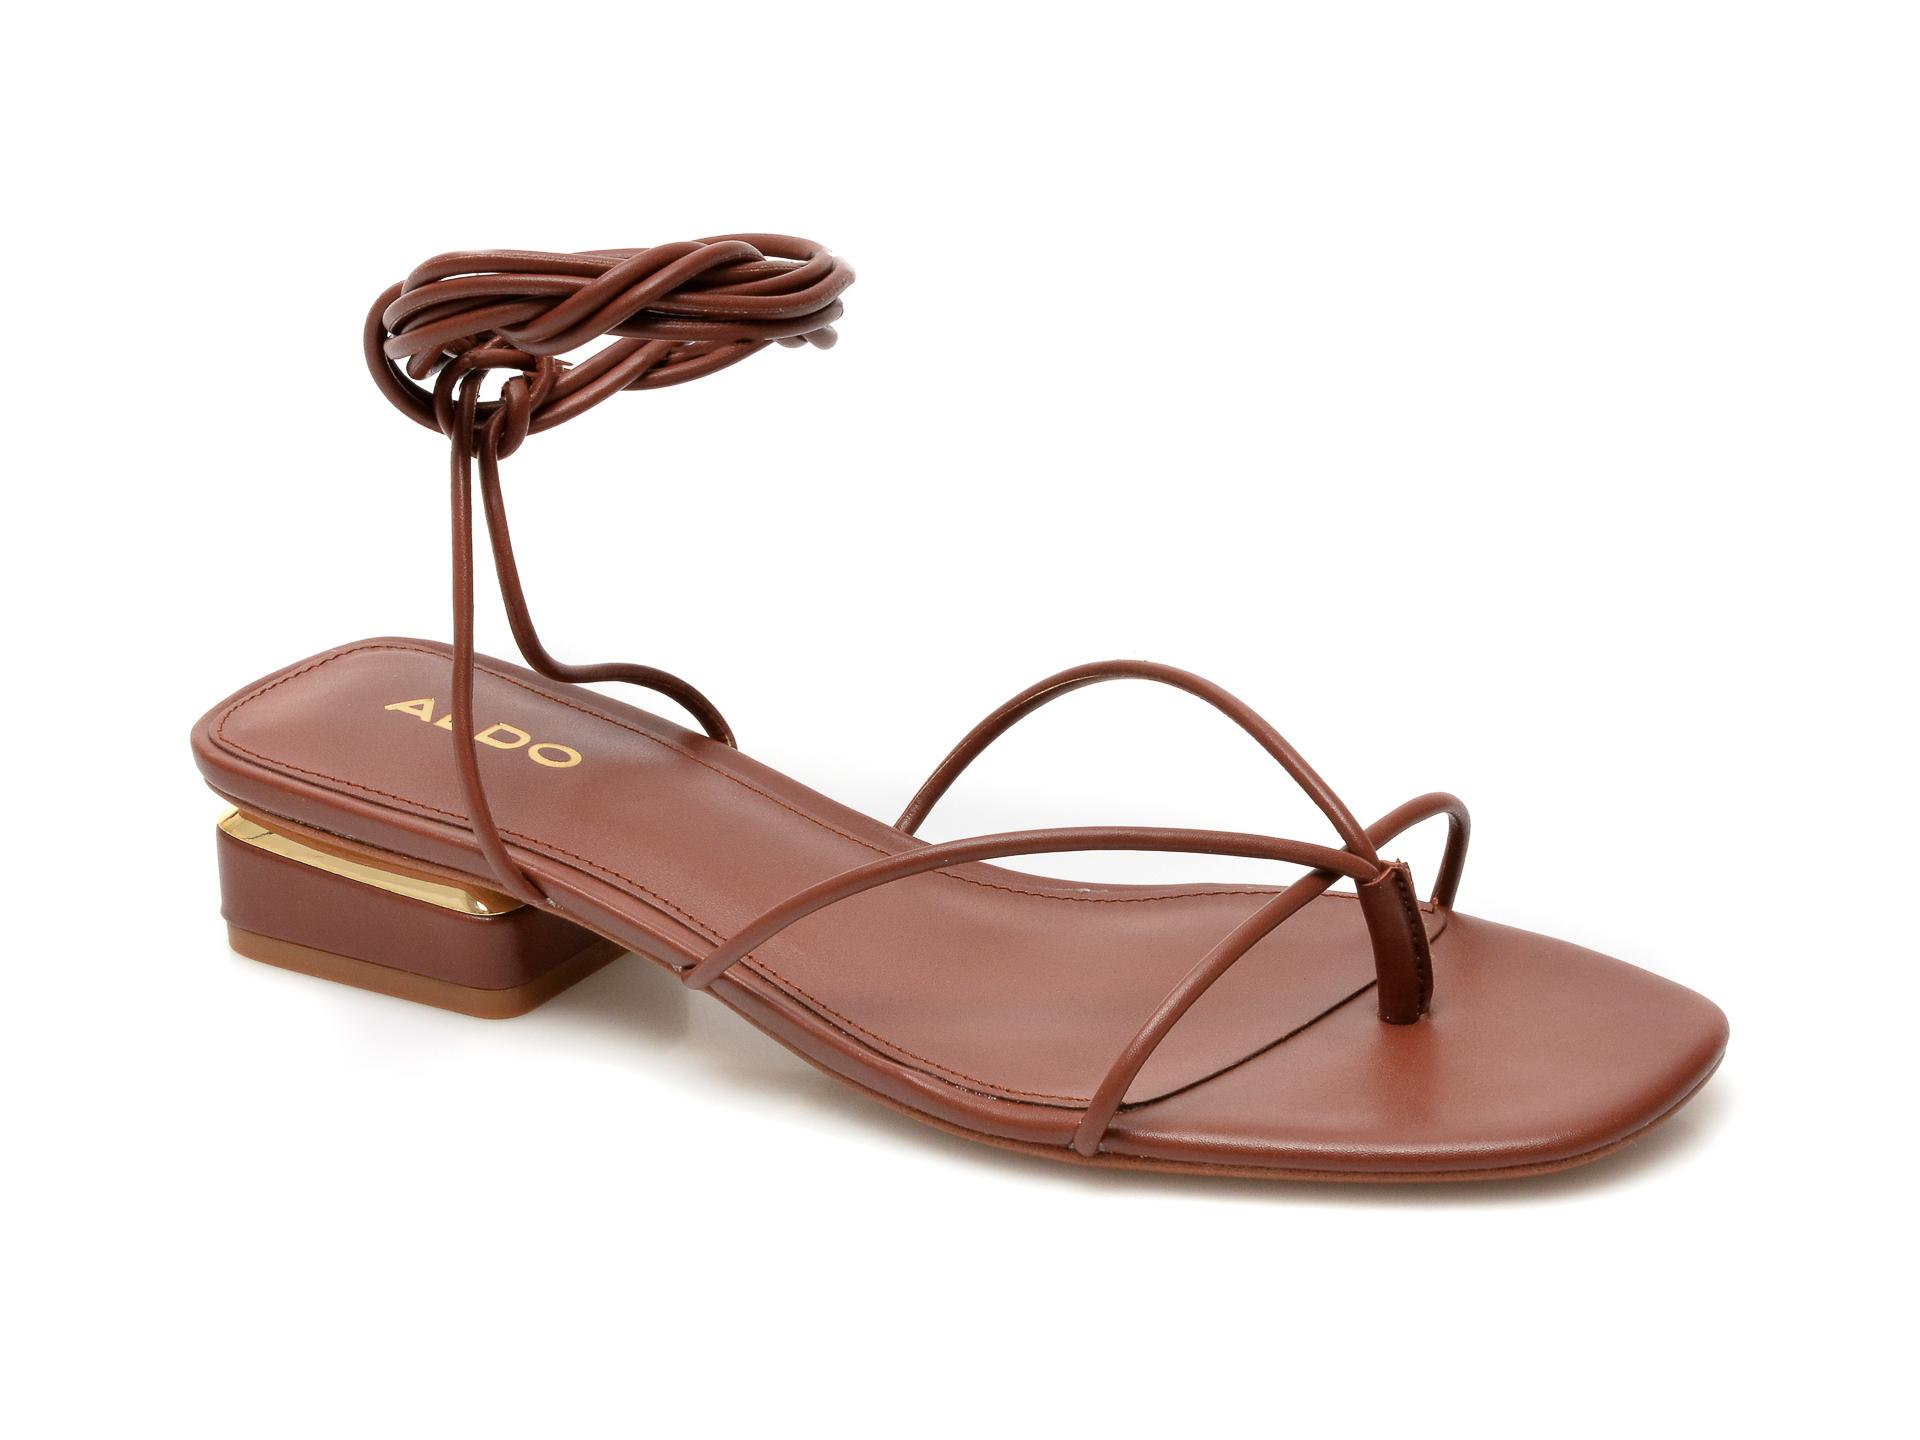 Sandale ALDO maro, Giannaflex210, din piele ecologica imagine otter.ro